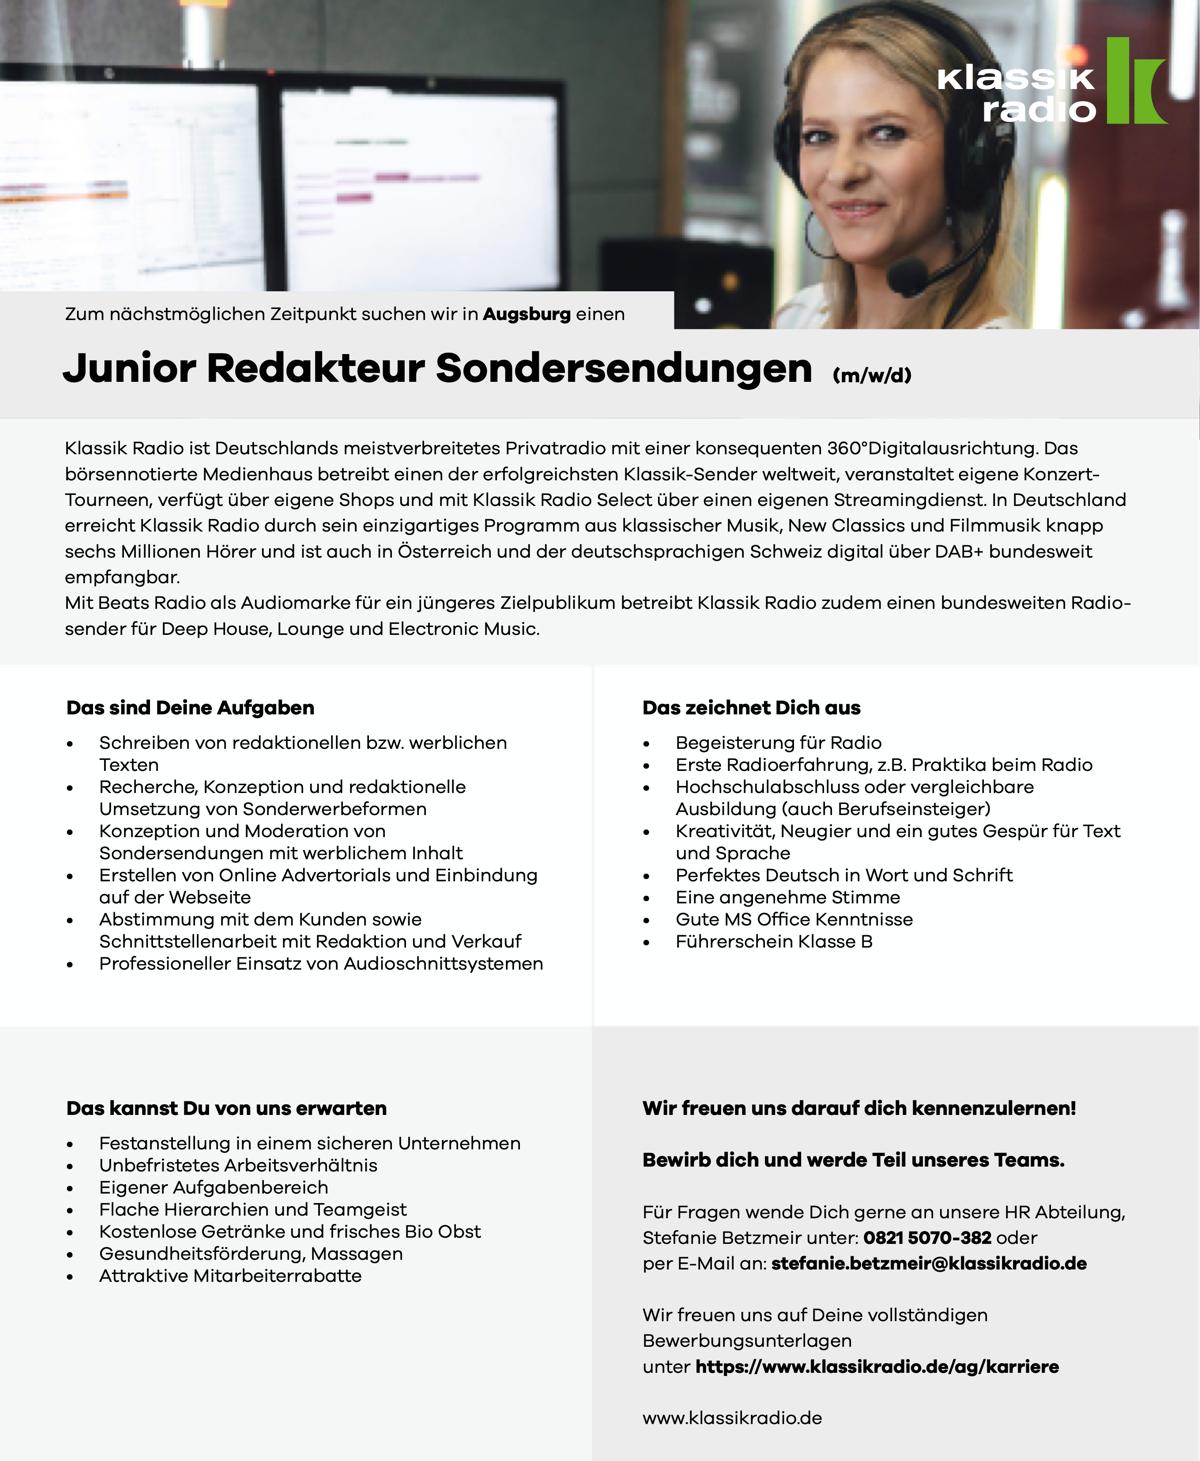 Klassik Radio sucht Junior Redakteur Sondersendungen (m/w/d)